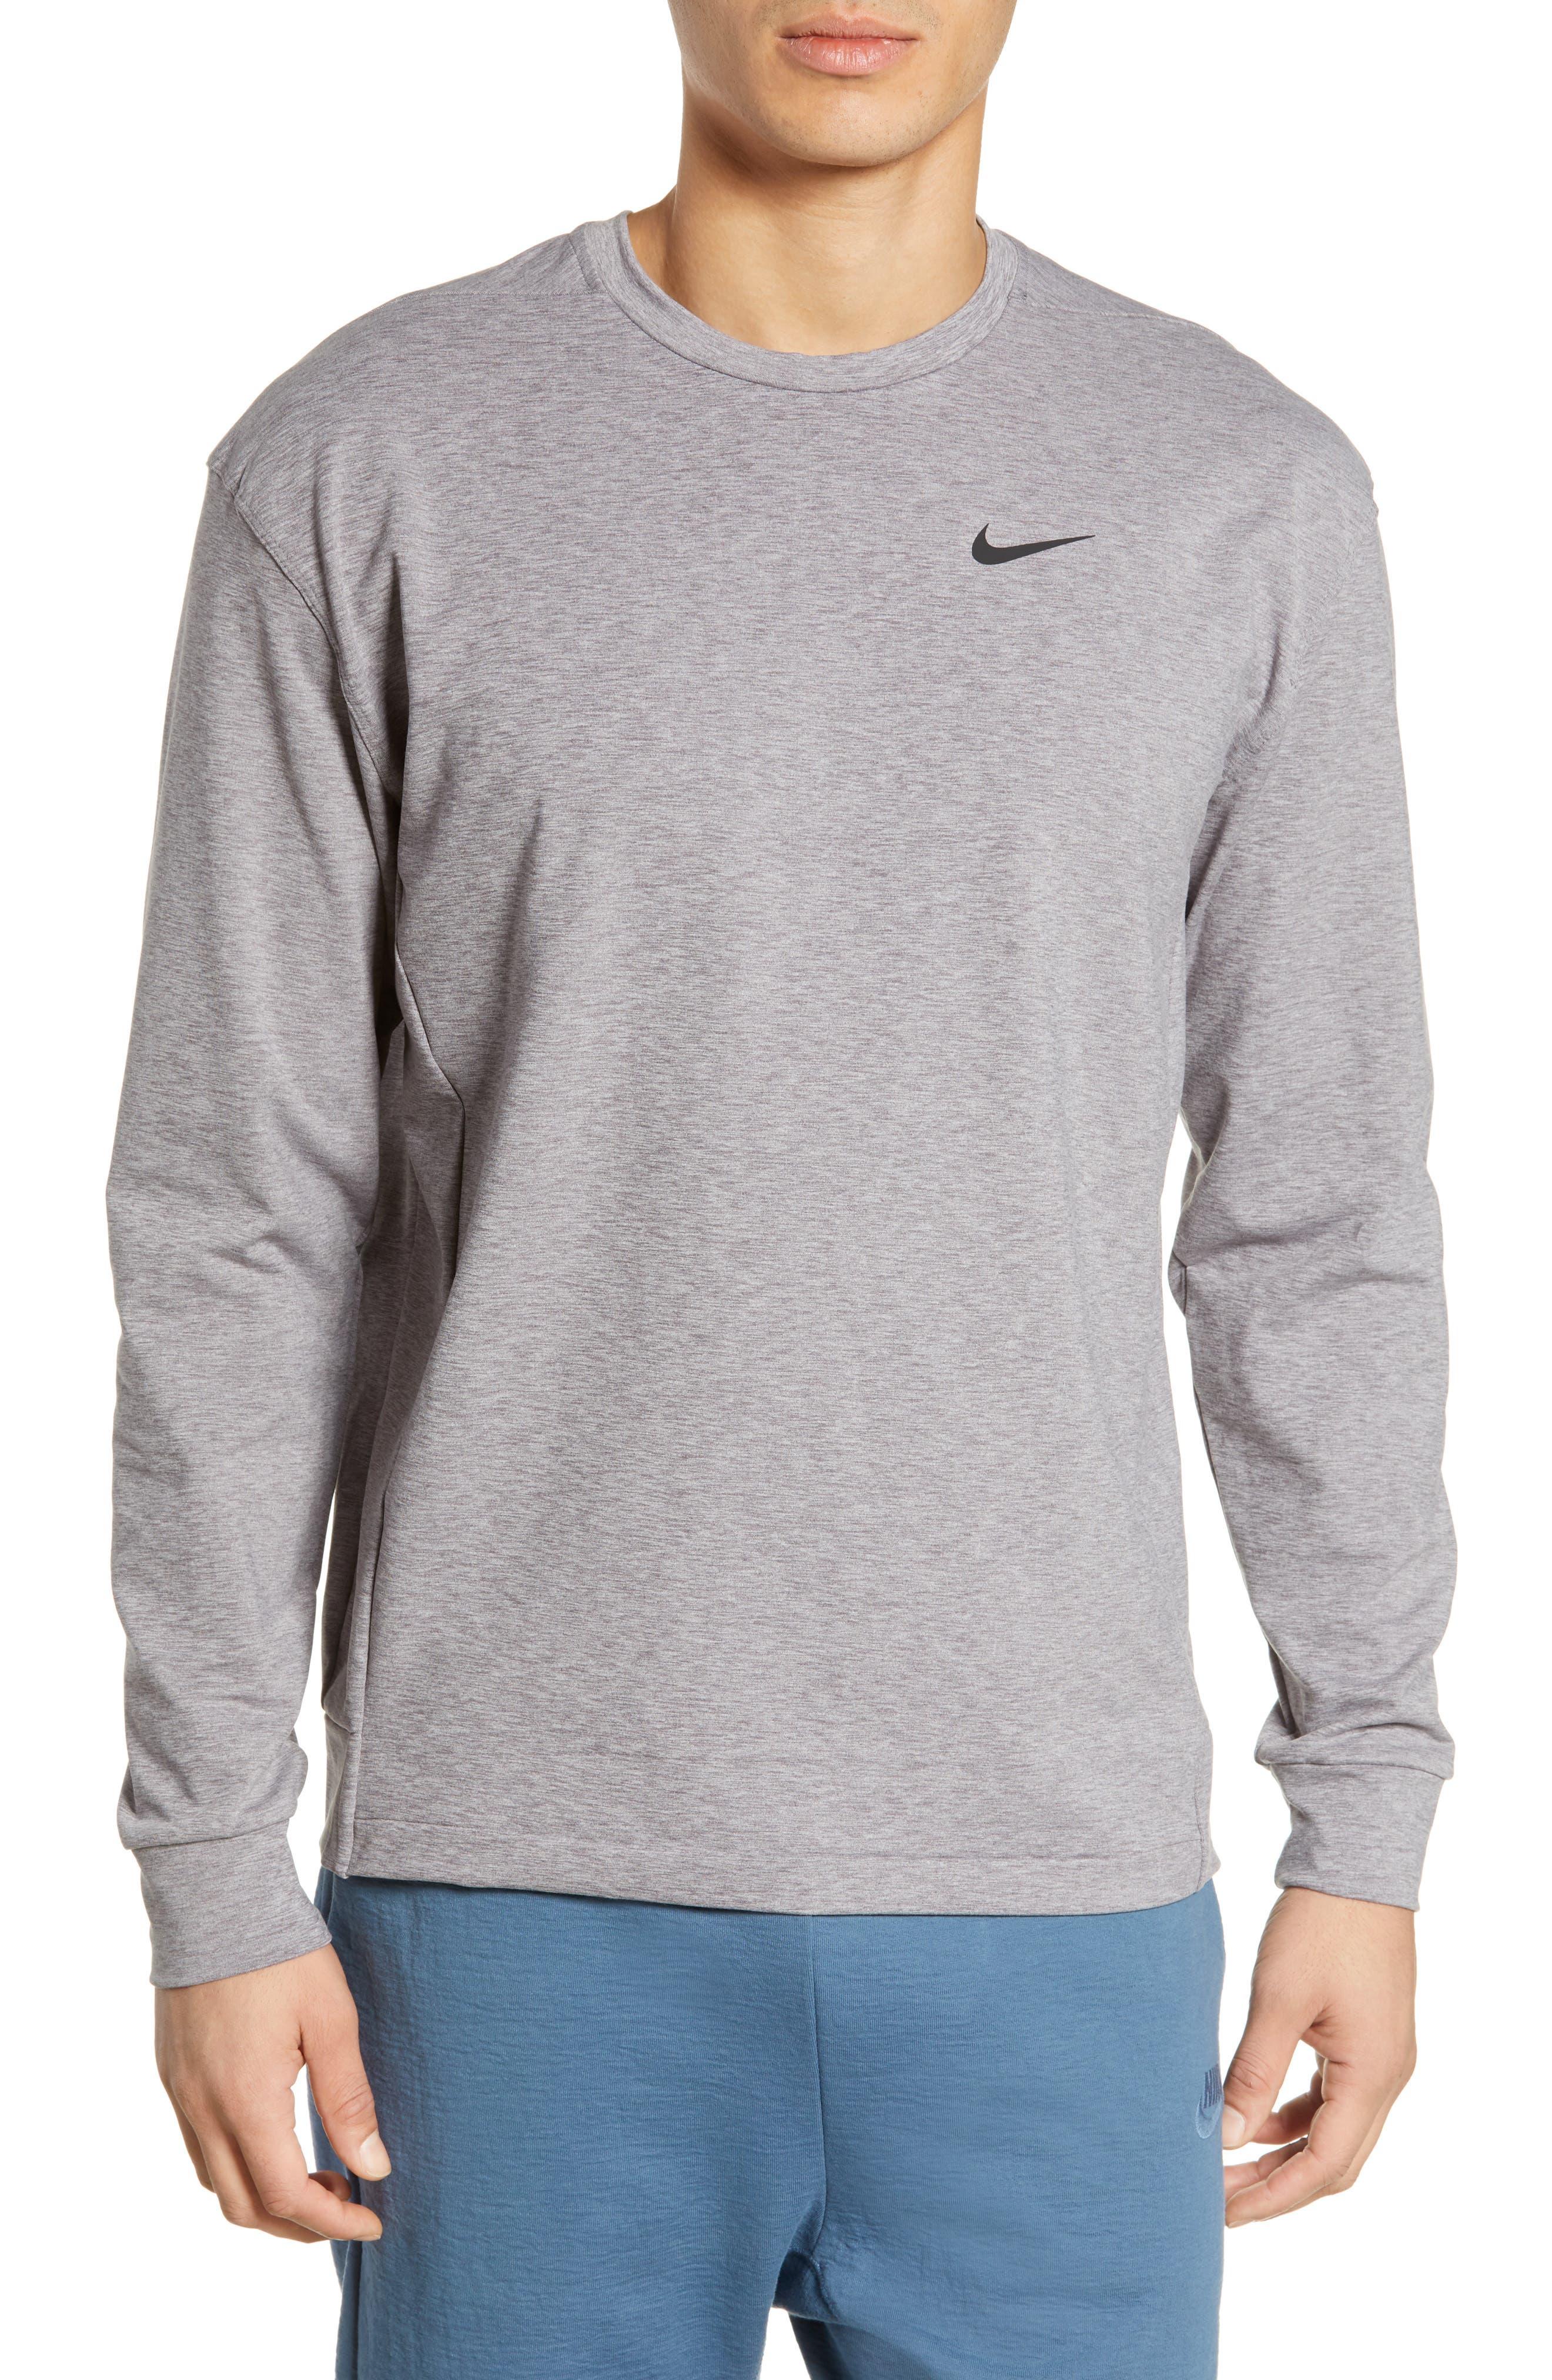 Nike Dry Crewneck T-Shirt